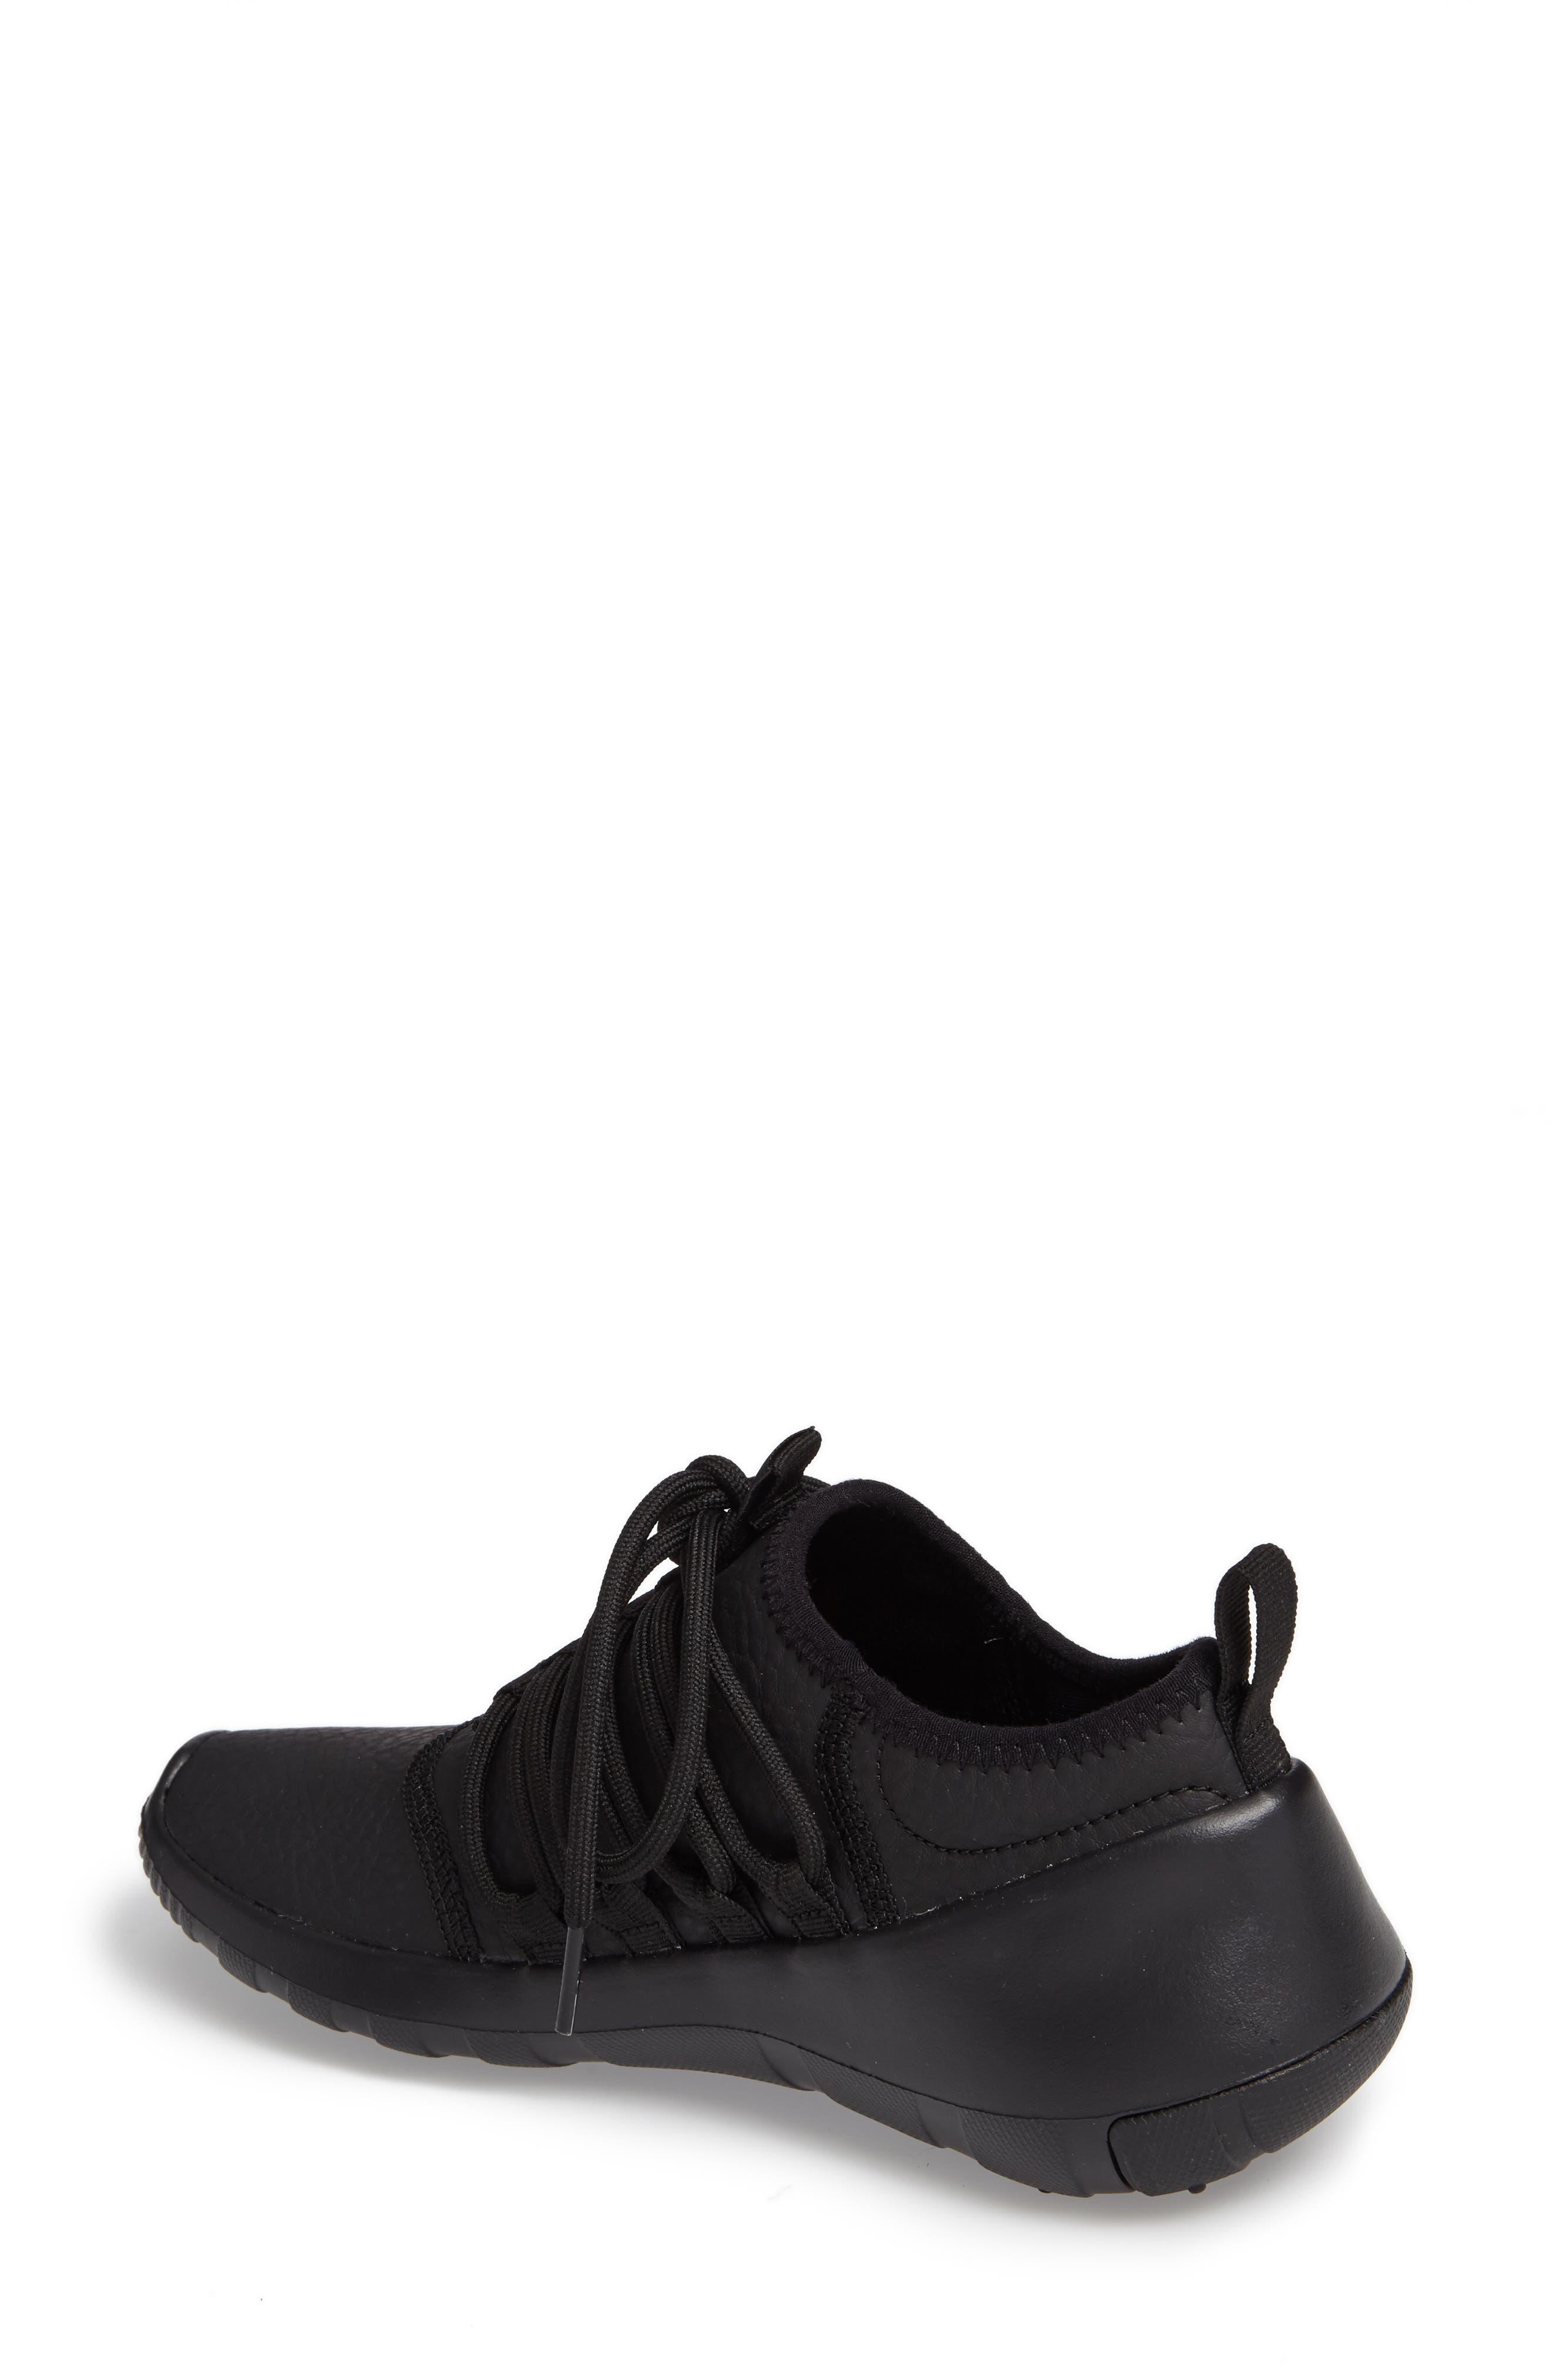 Payaa Premium Sneaker,                             Alternate thumbnail 2, color,                             001